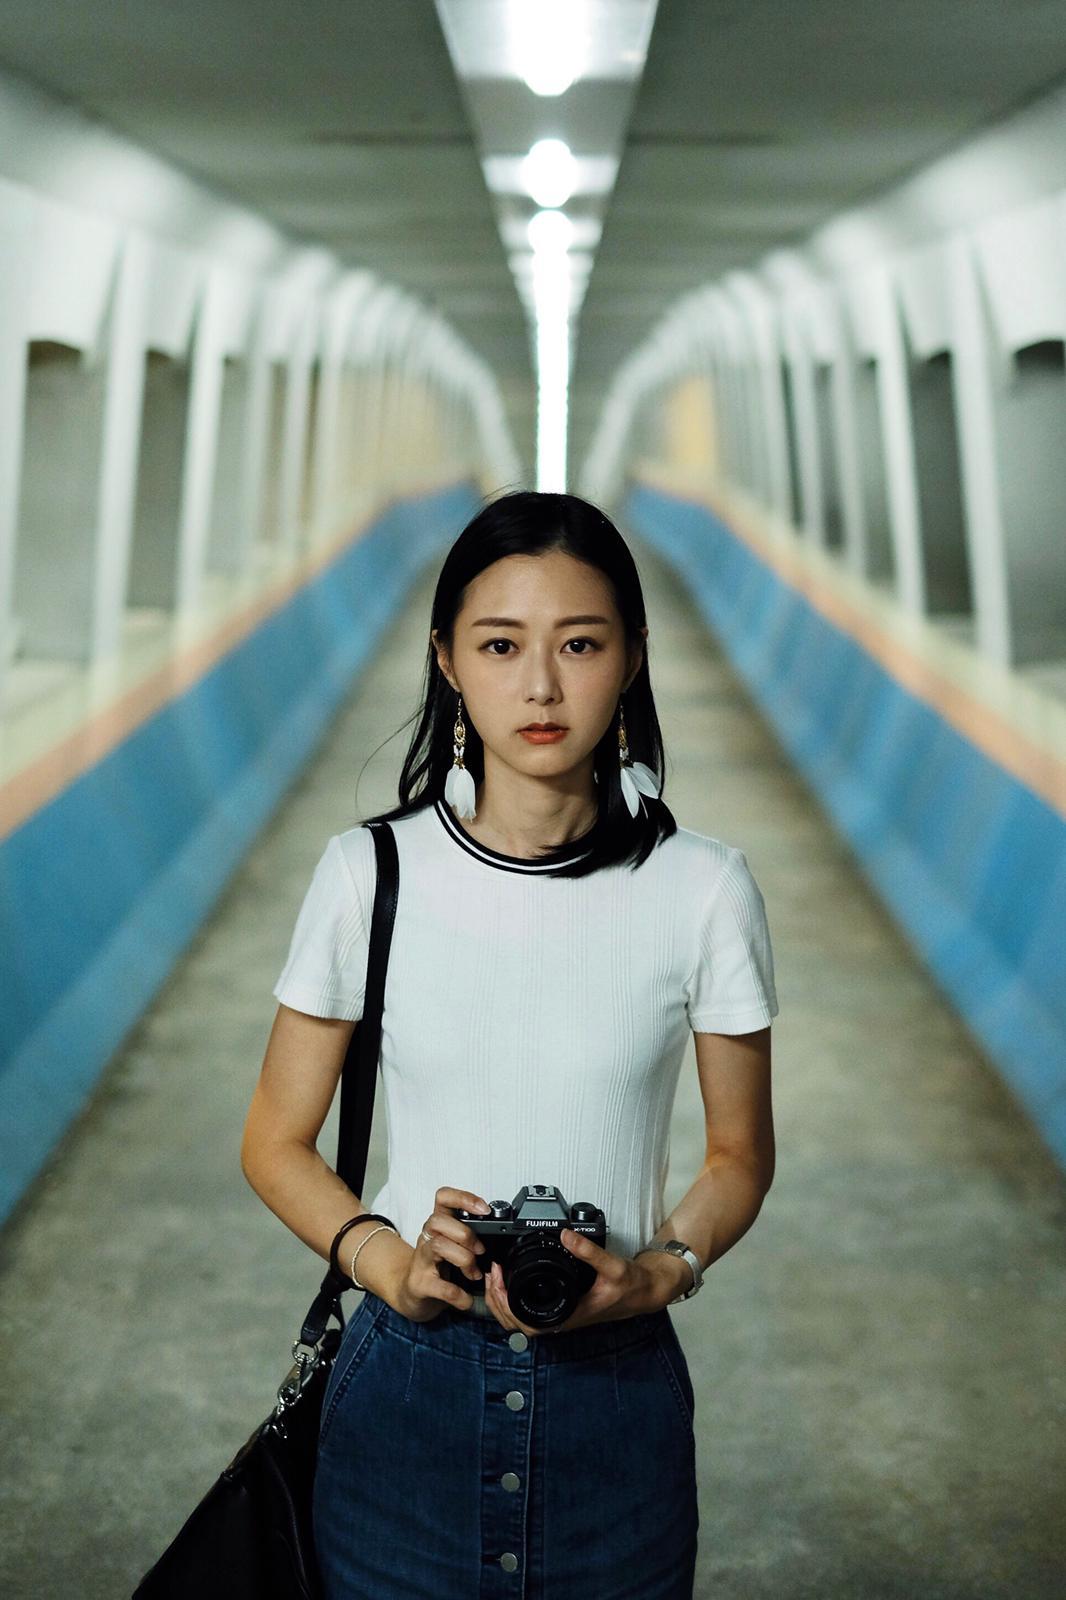 christy au yeung